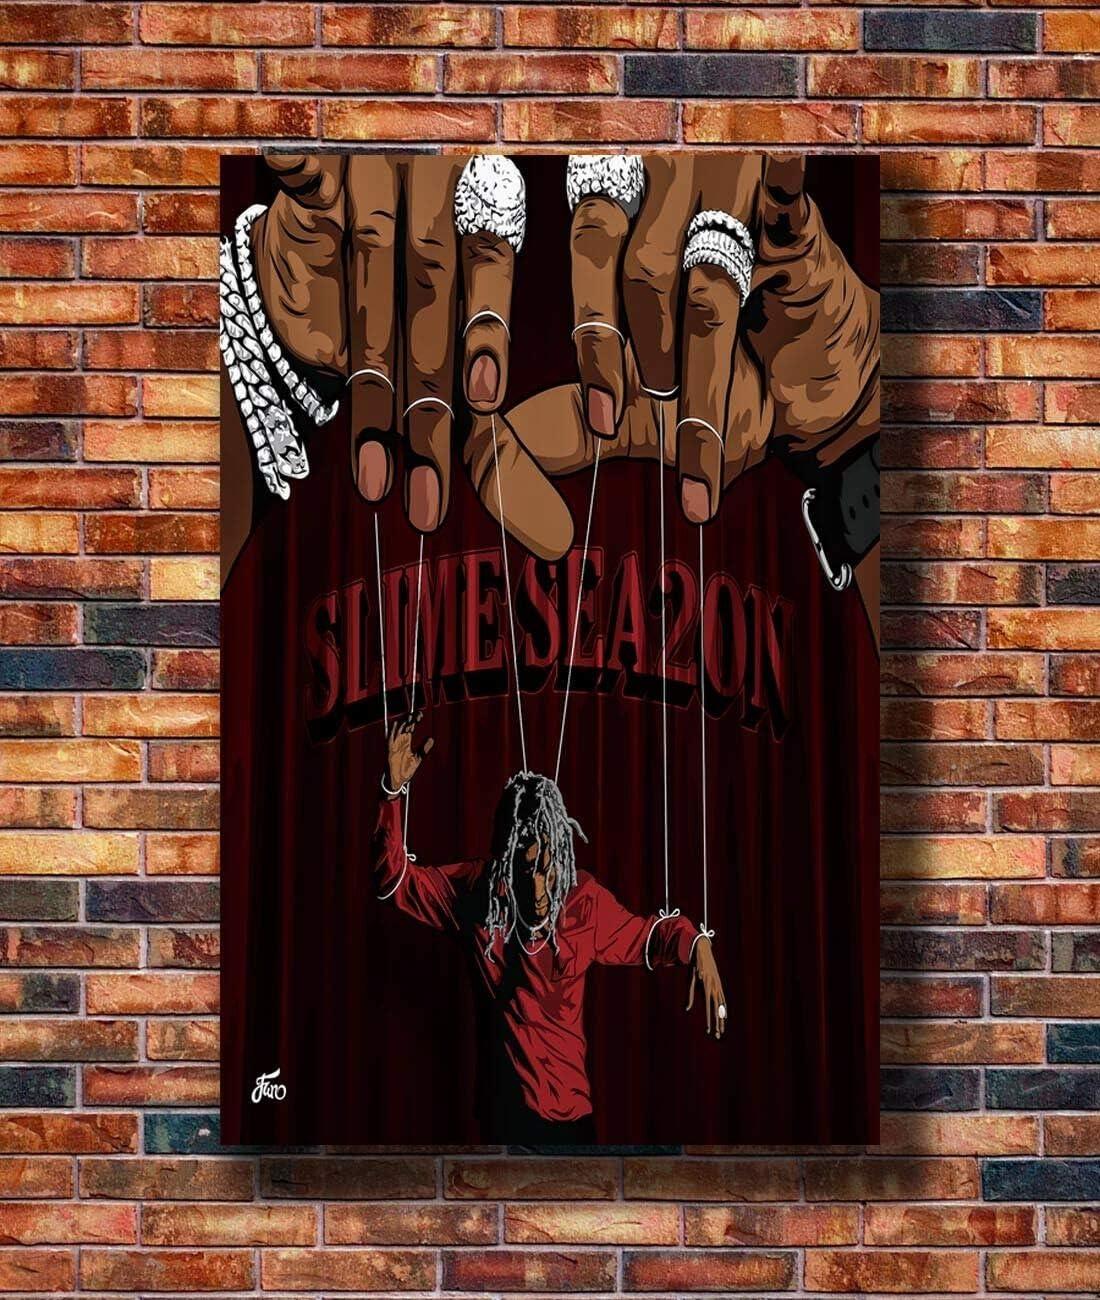 N1034 Young Thug Slime Language Cover 2018 Album 24x24 20 Silk Poster